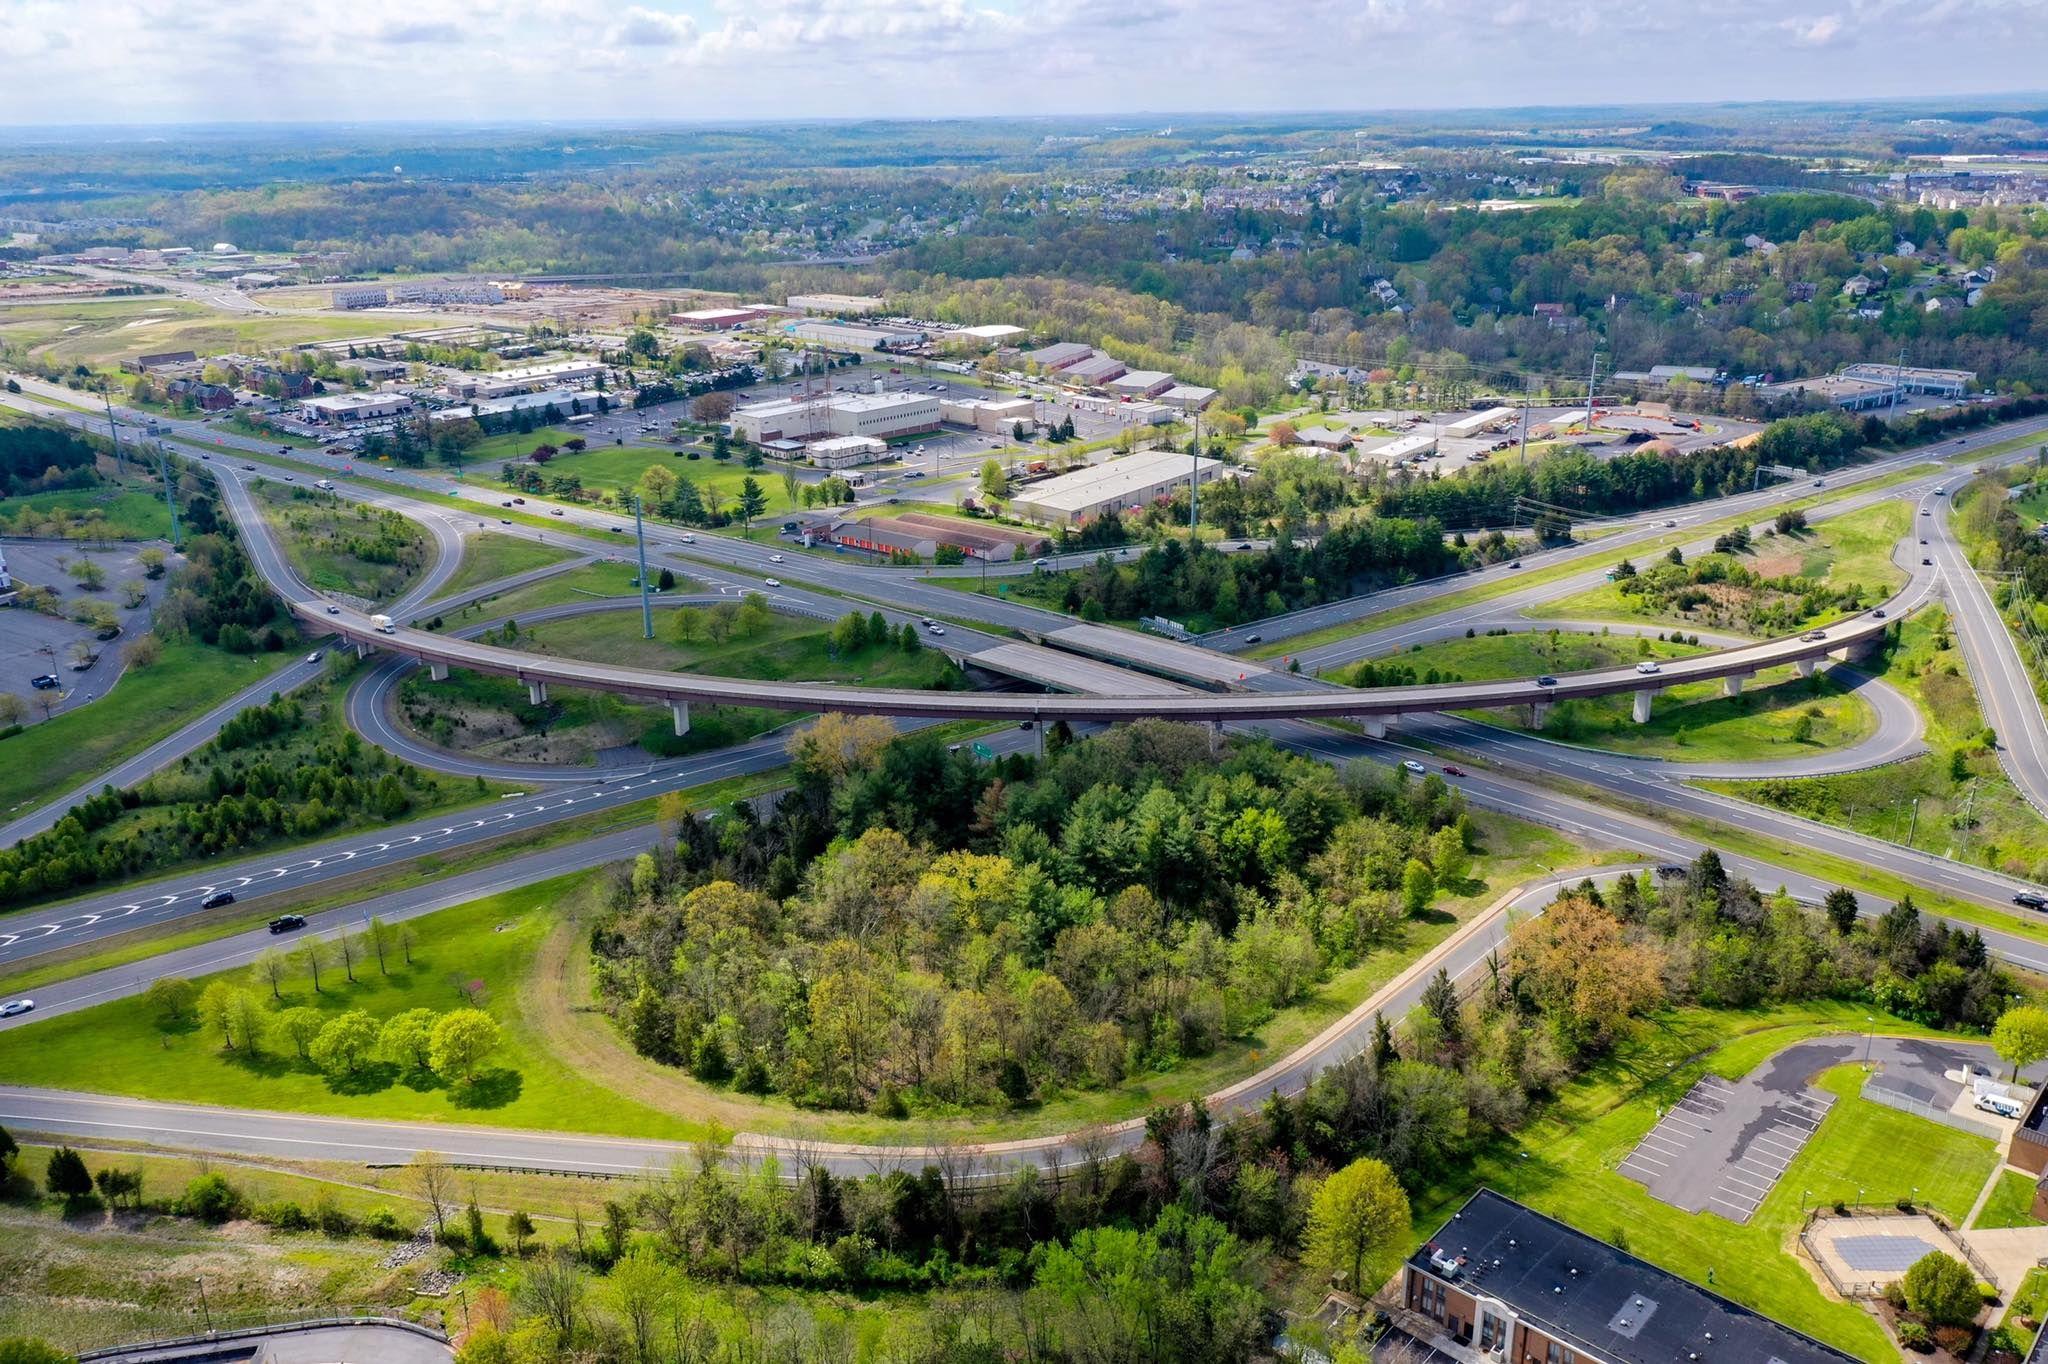 Leesburg, Virginia, Route 7 & Route 15 interchange.